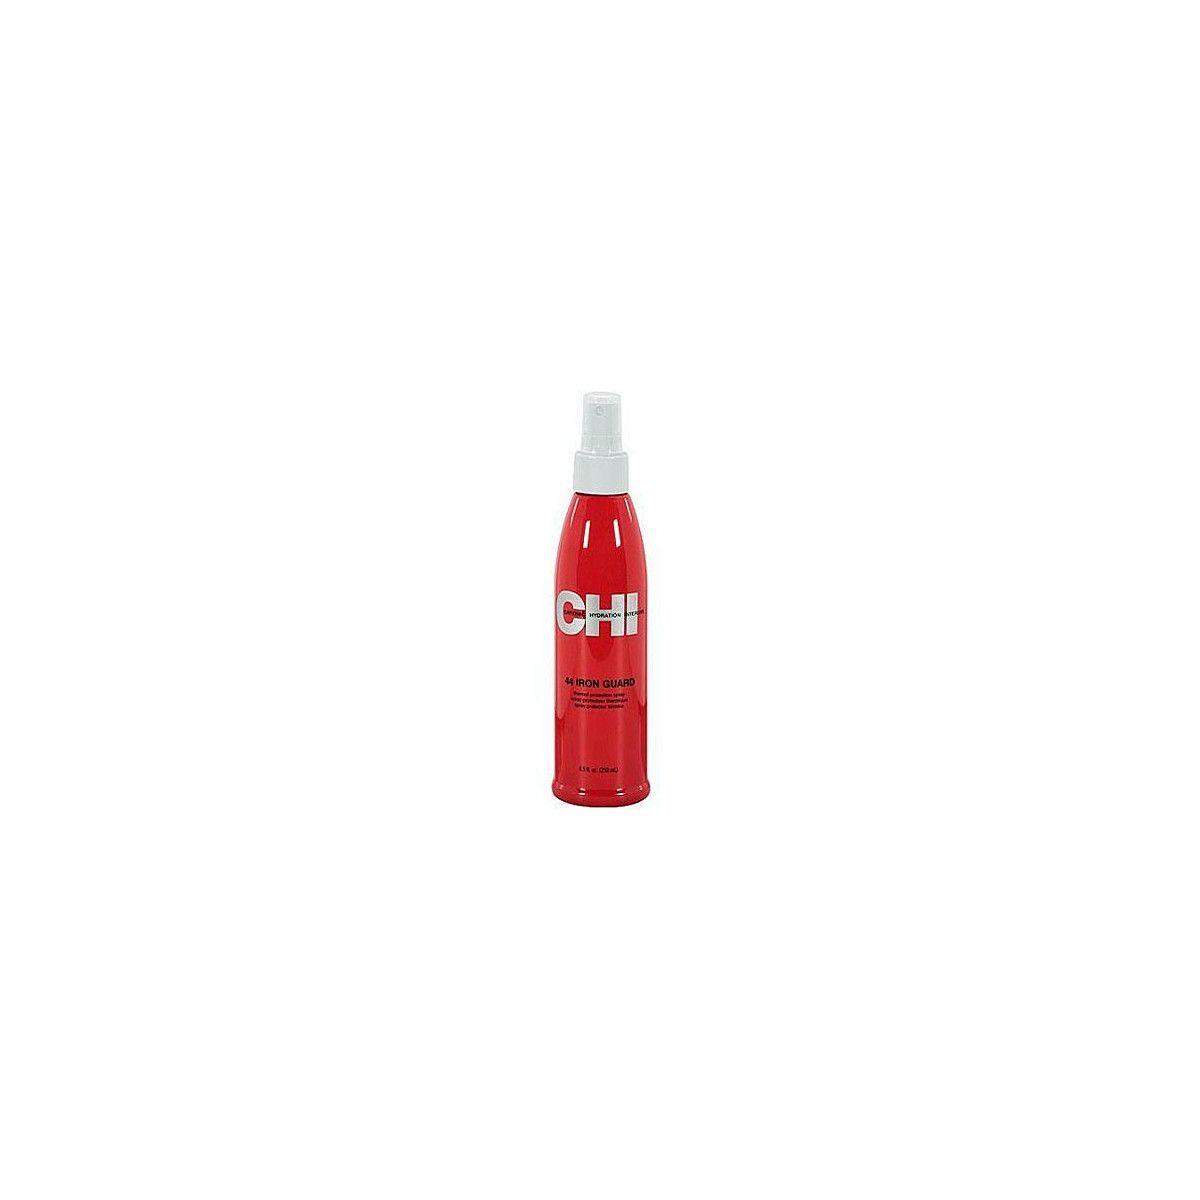 Farouk Chi 44 Iron Guard Thermal Protection Spray do Ochrony przed Temperaturą 251 ml